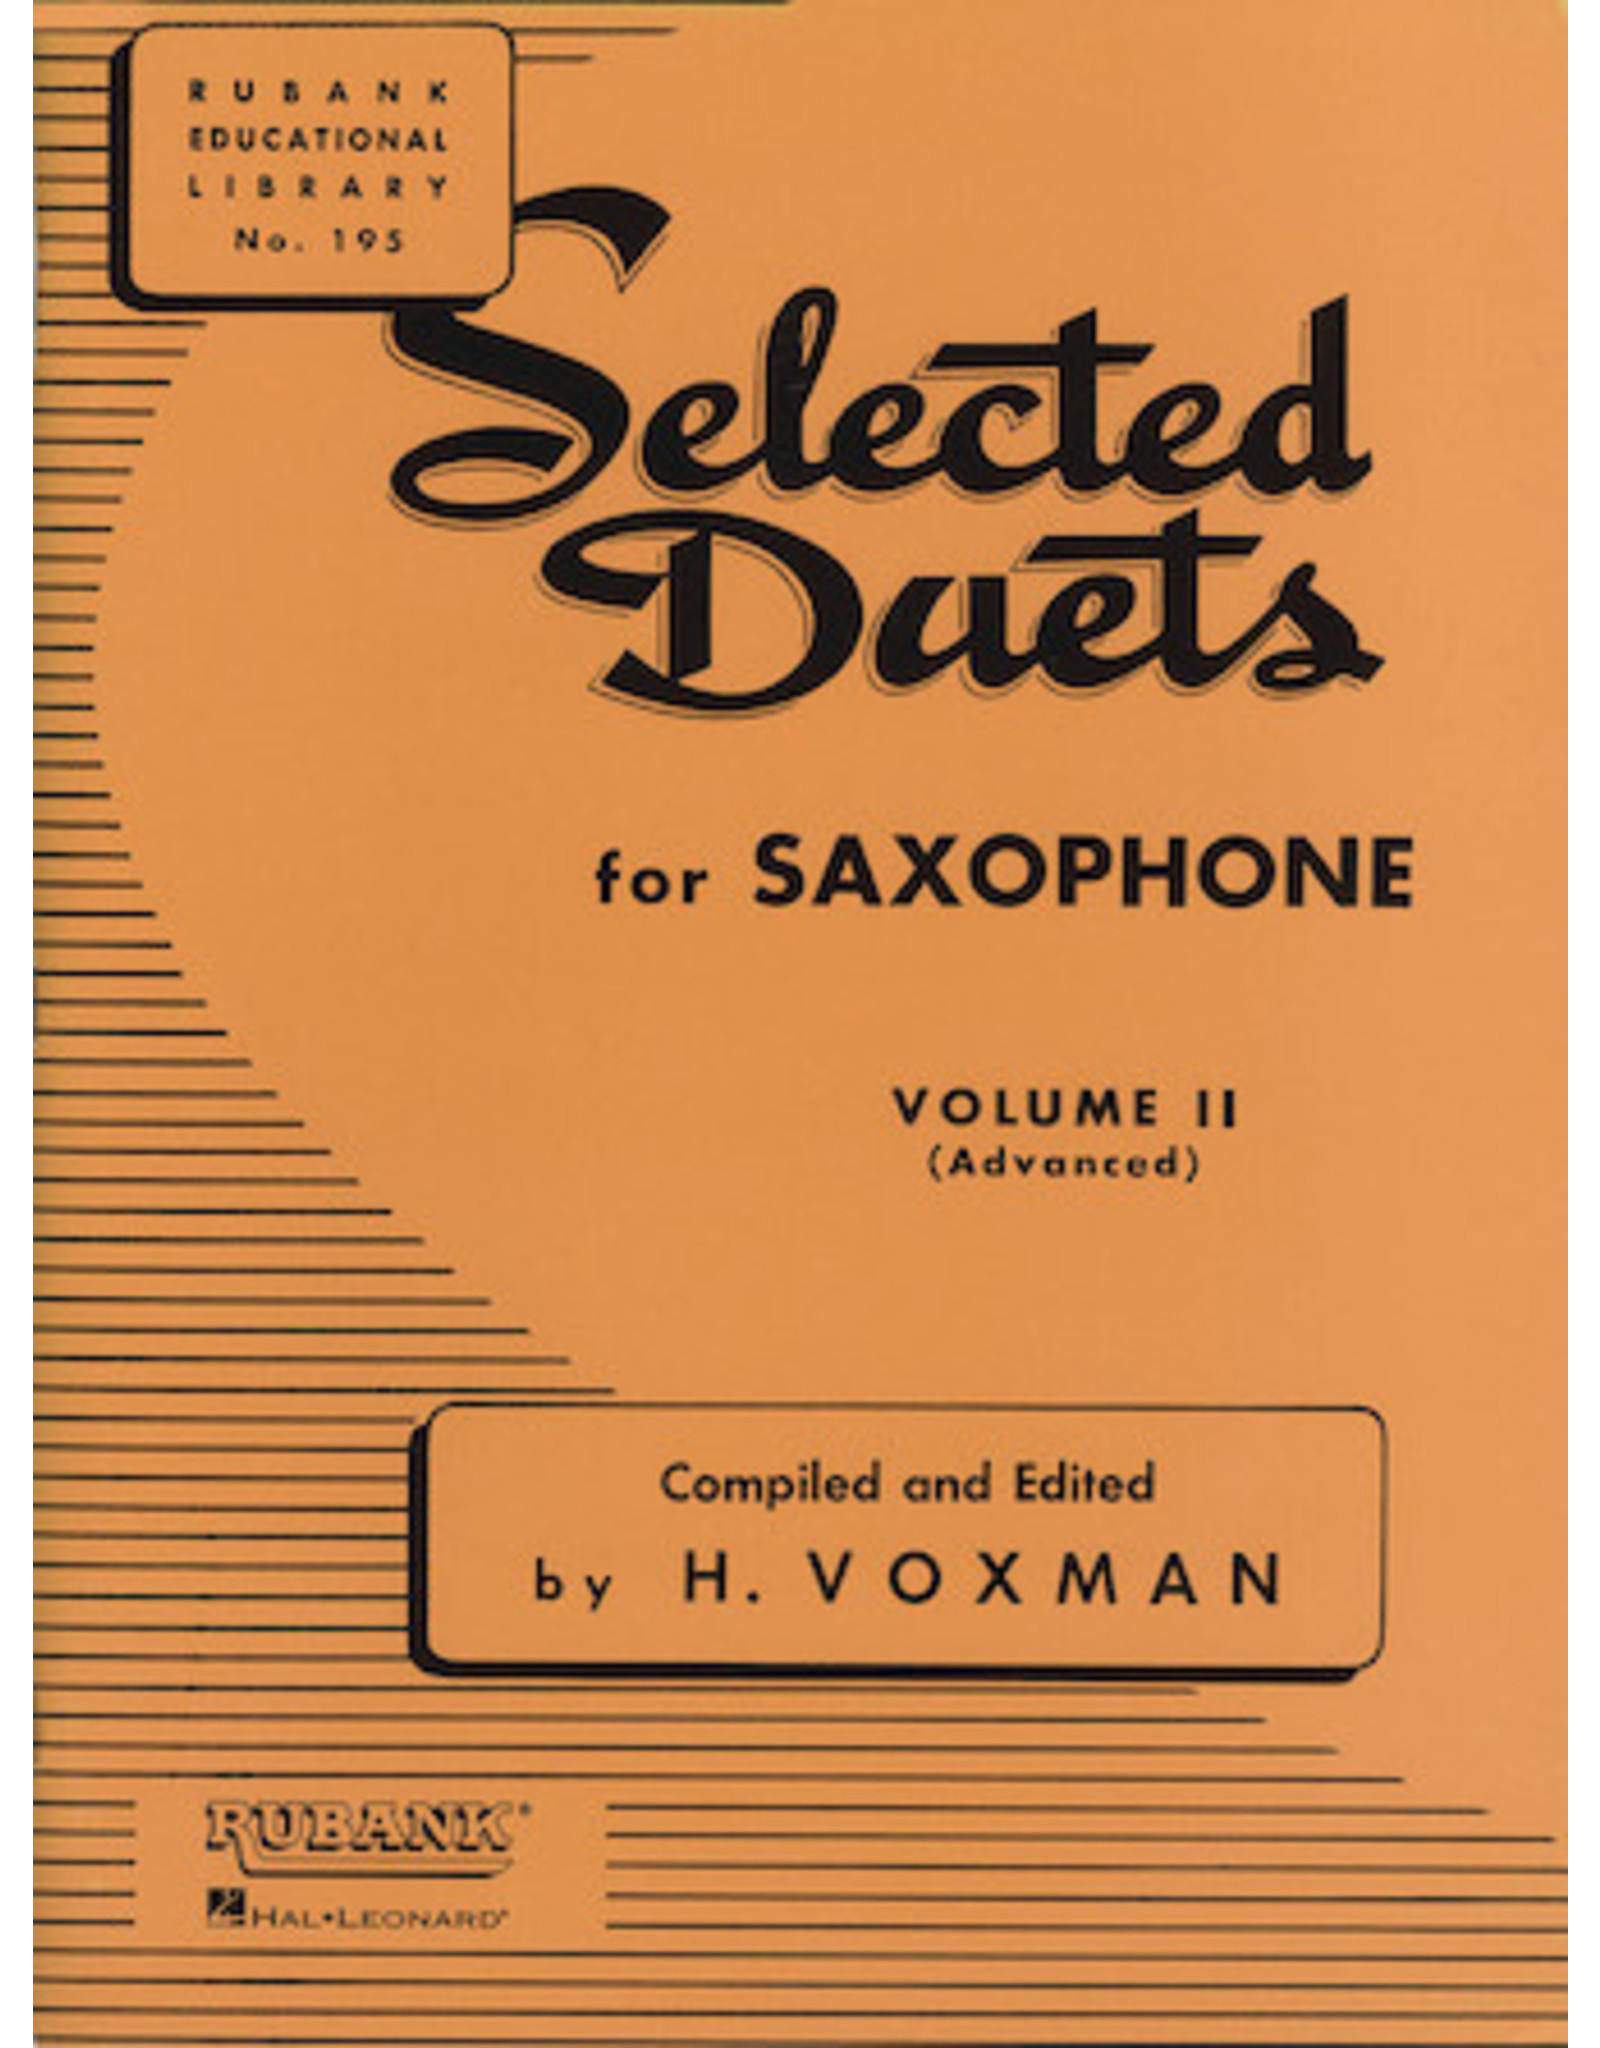 Hal Leonard Selected Duets for Saxophone Volume 2 - Advanced edited H. Voxman Ensemble Collection Volume 2